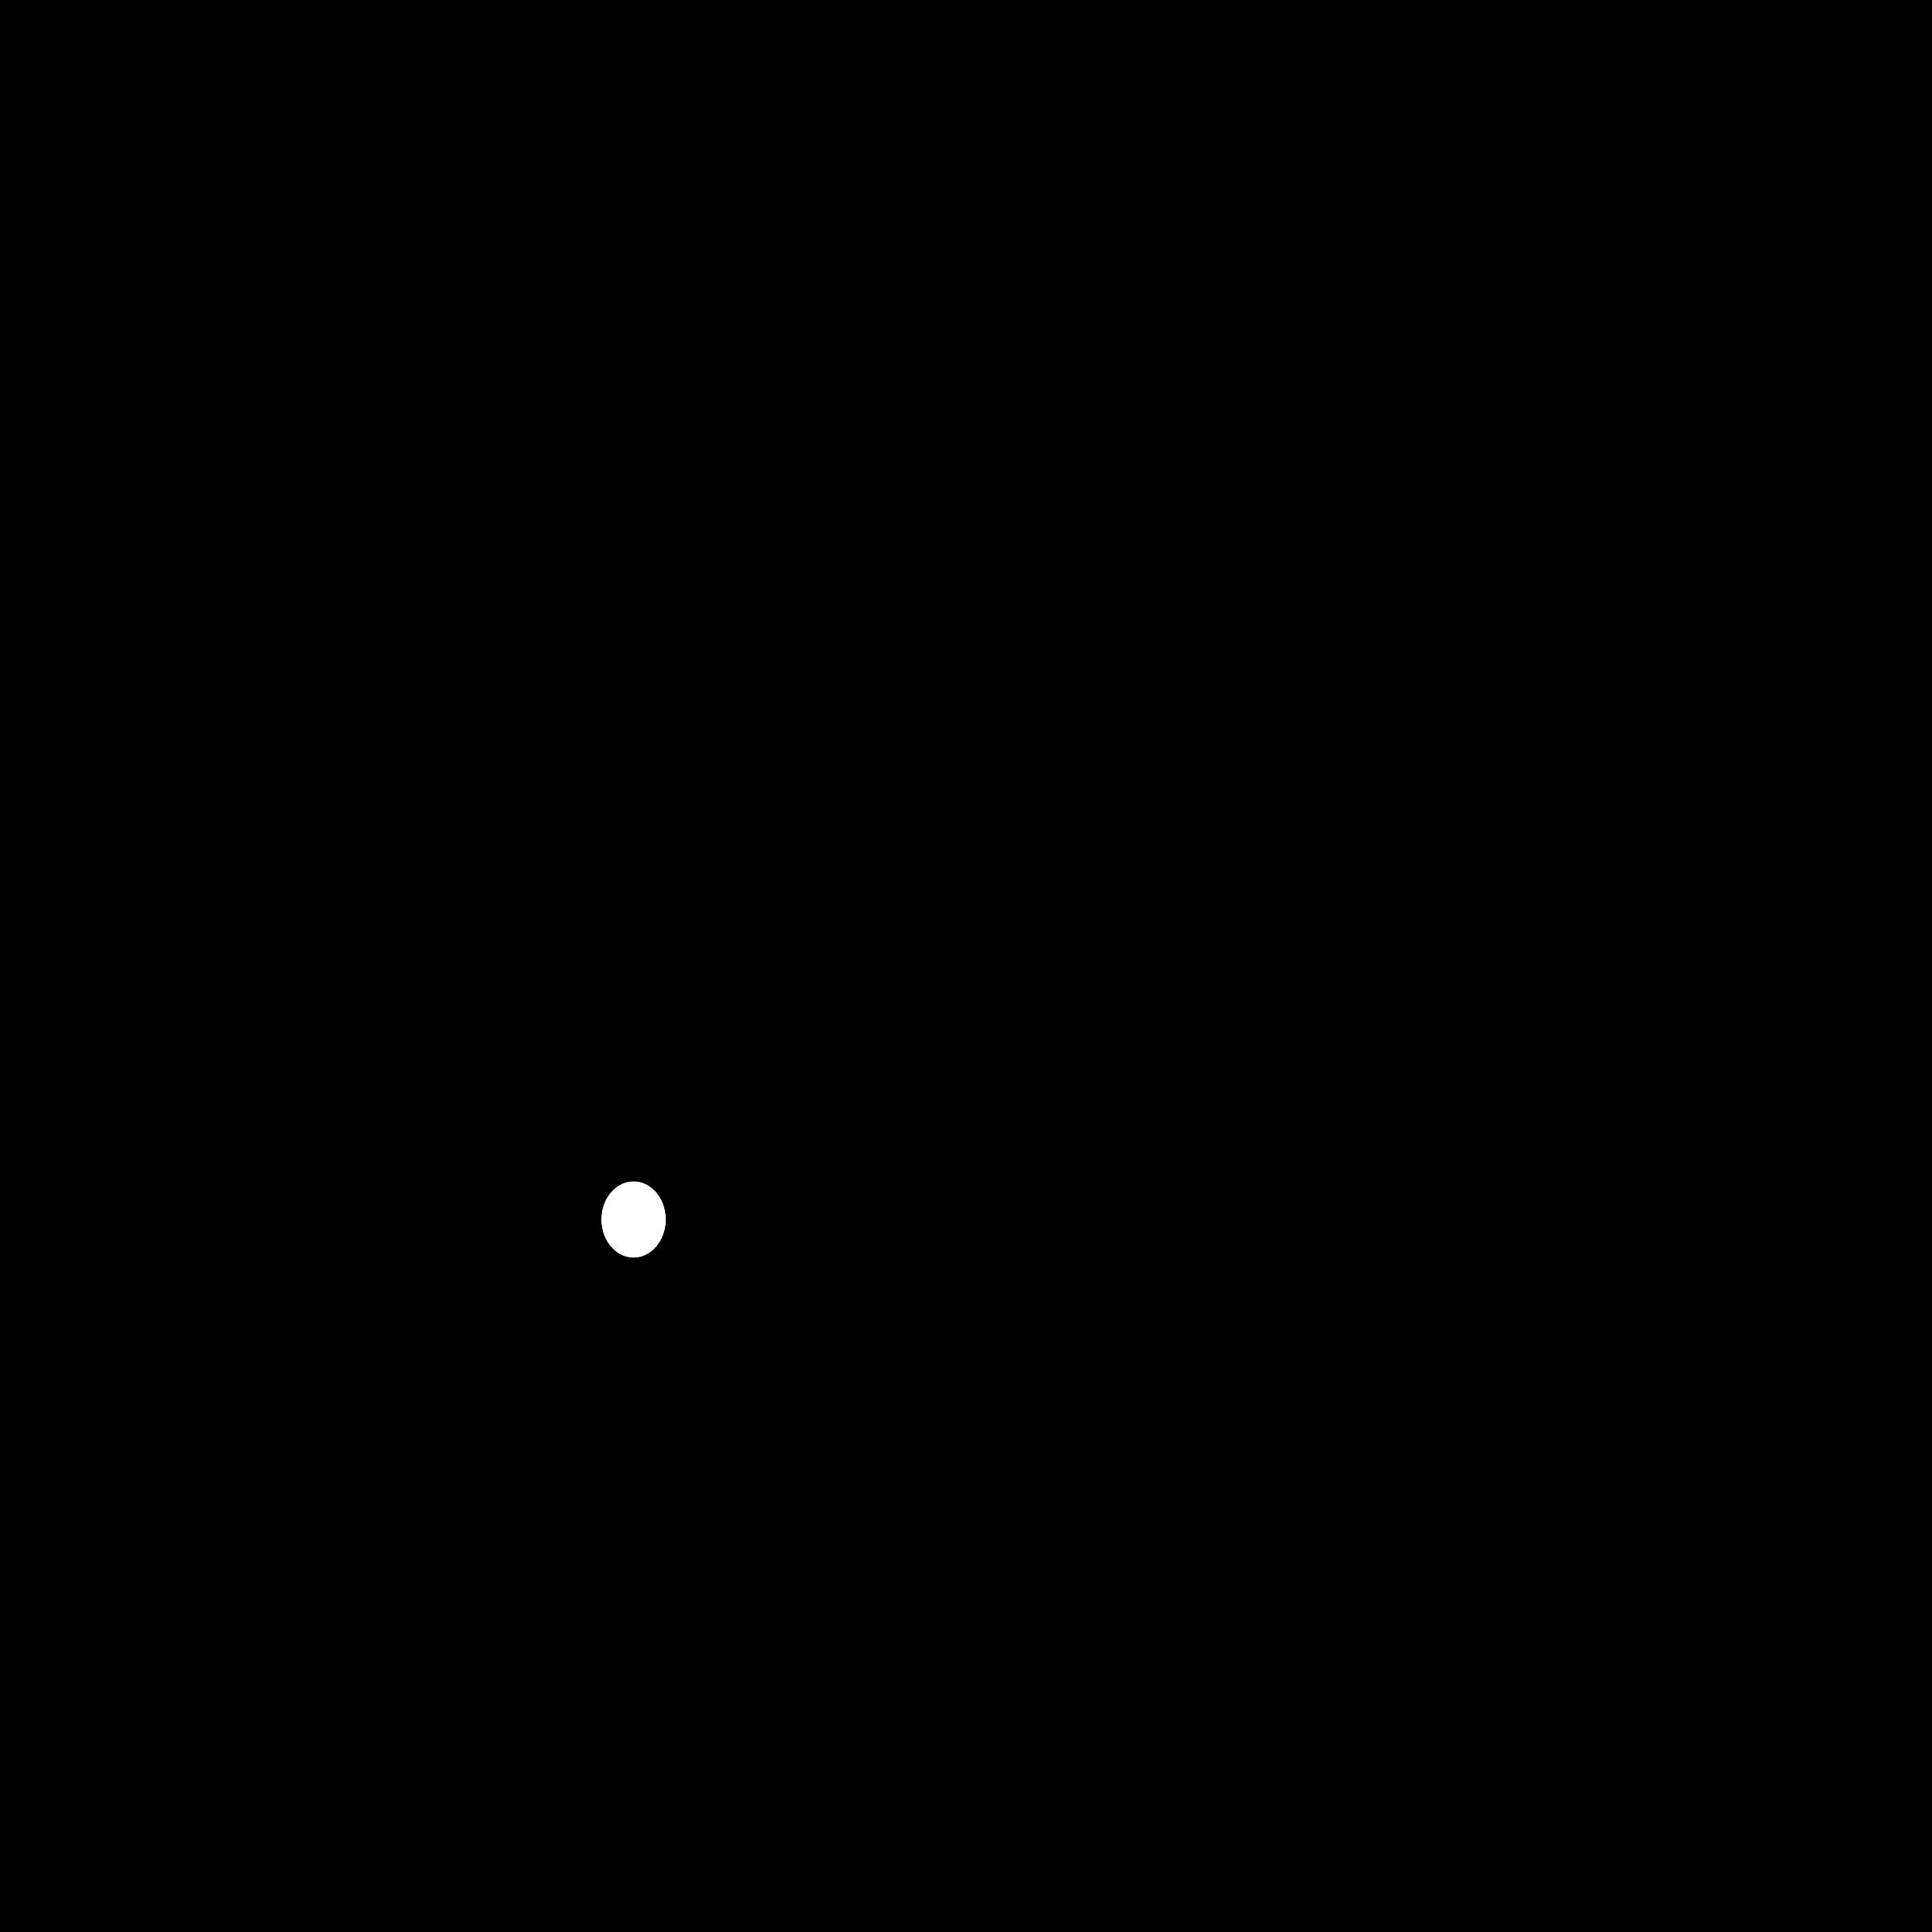 bang-olufsen-2-logo-png-transparent.png